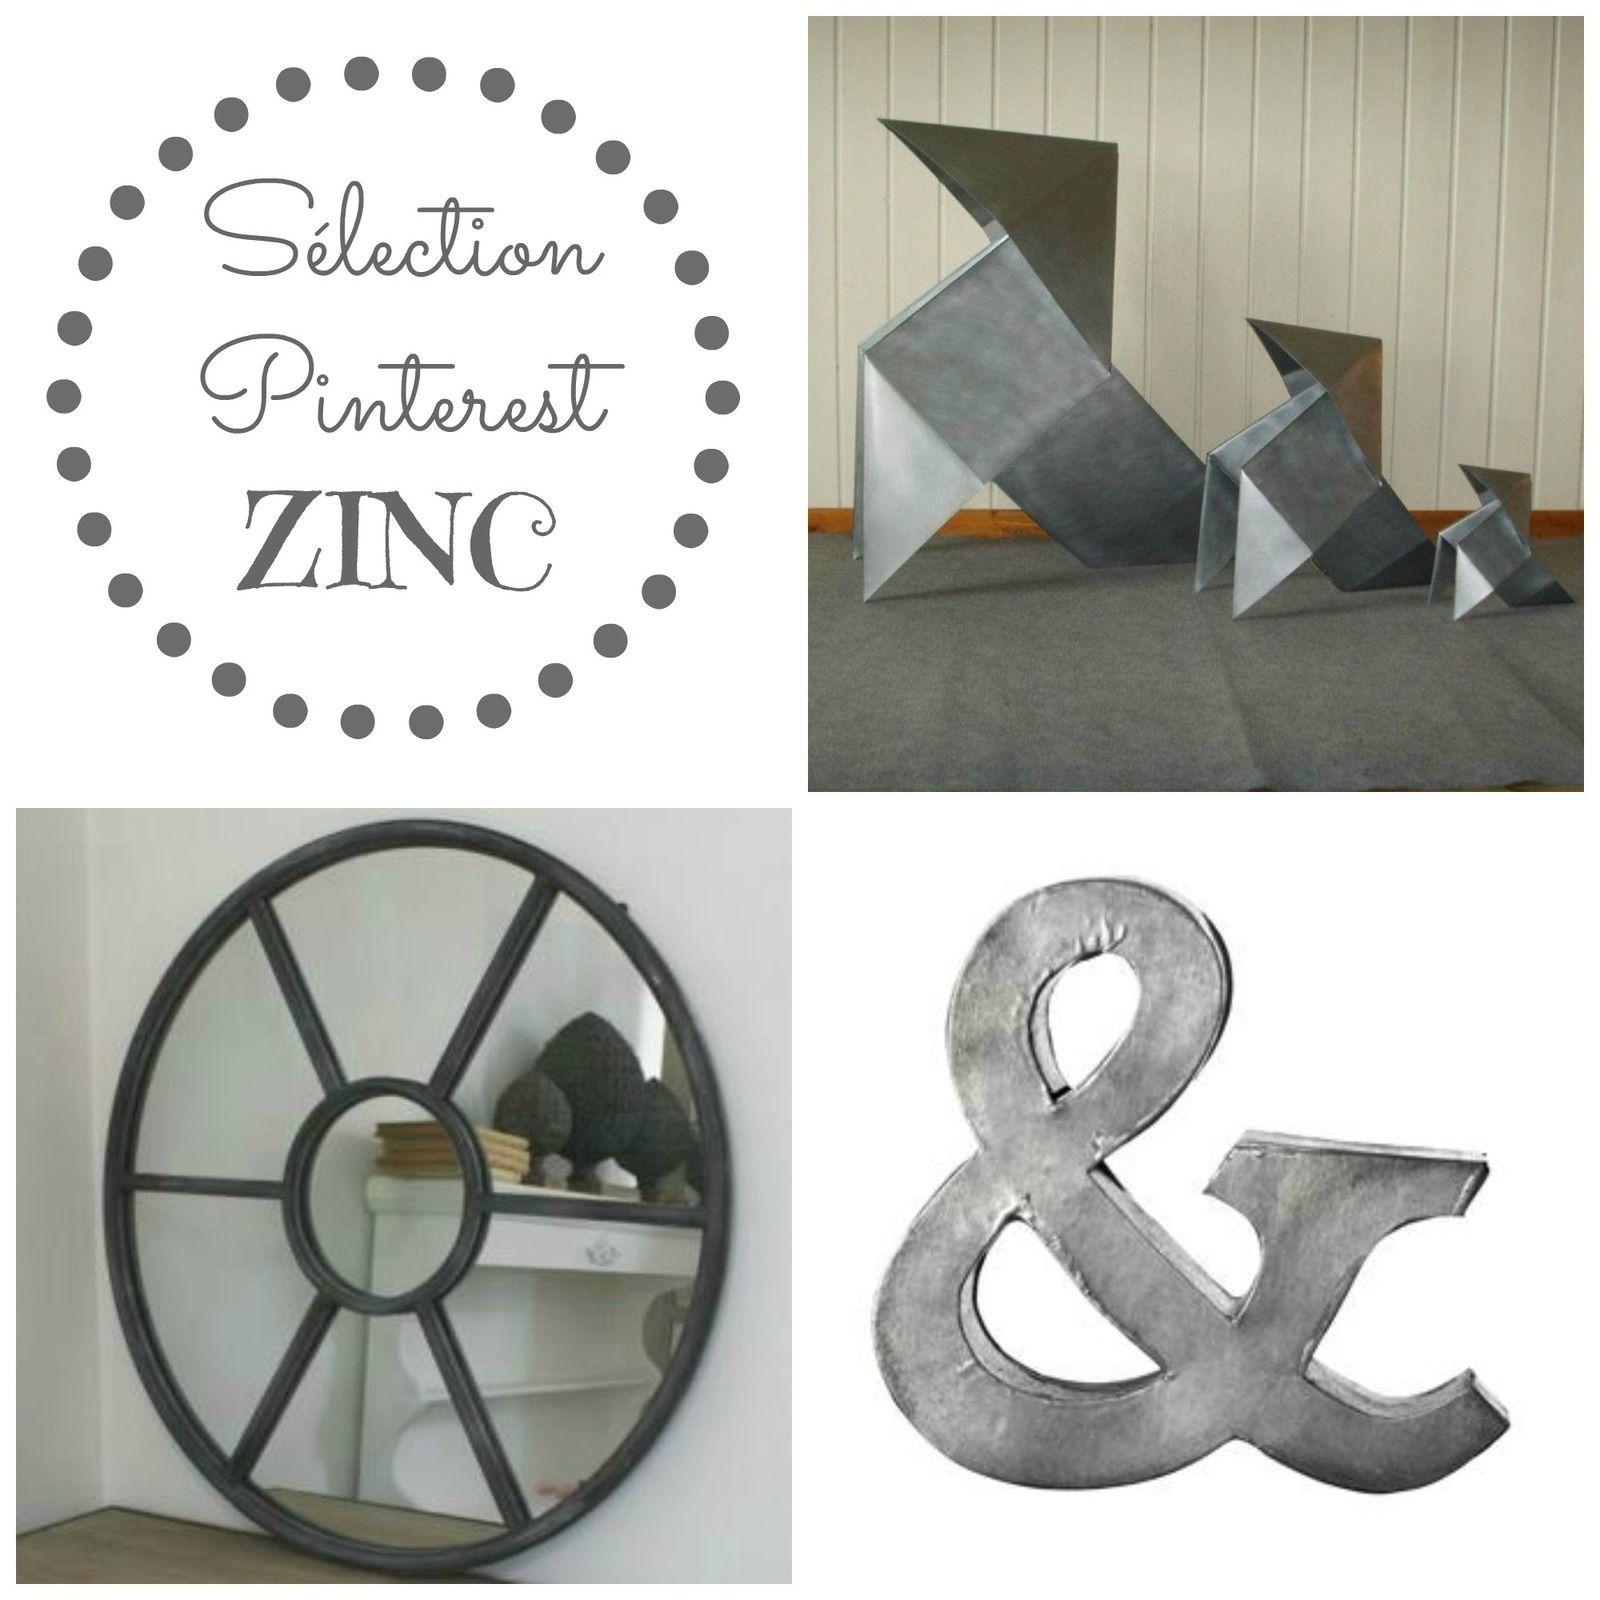 SELECTION PINTEREST #8 (zinc)